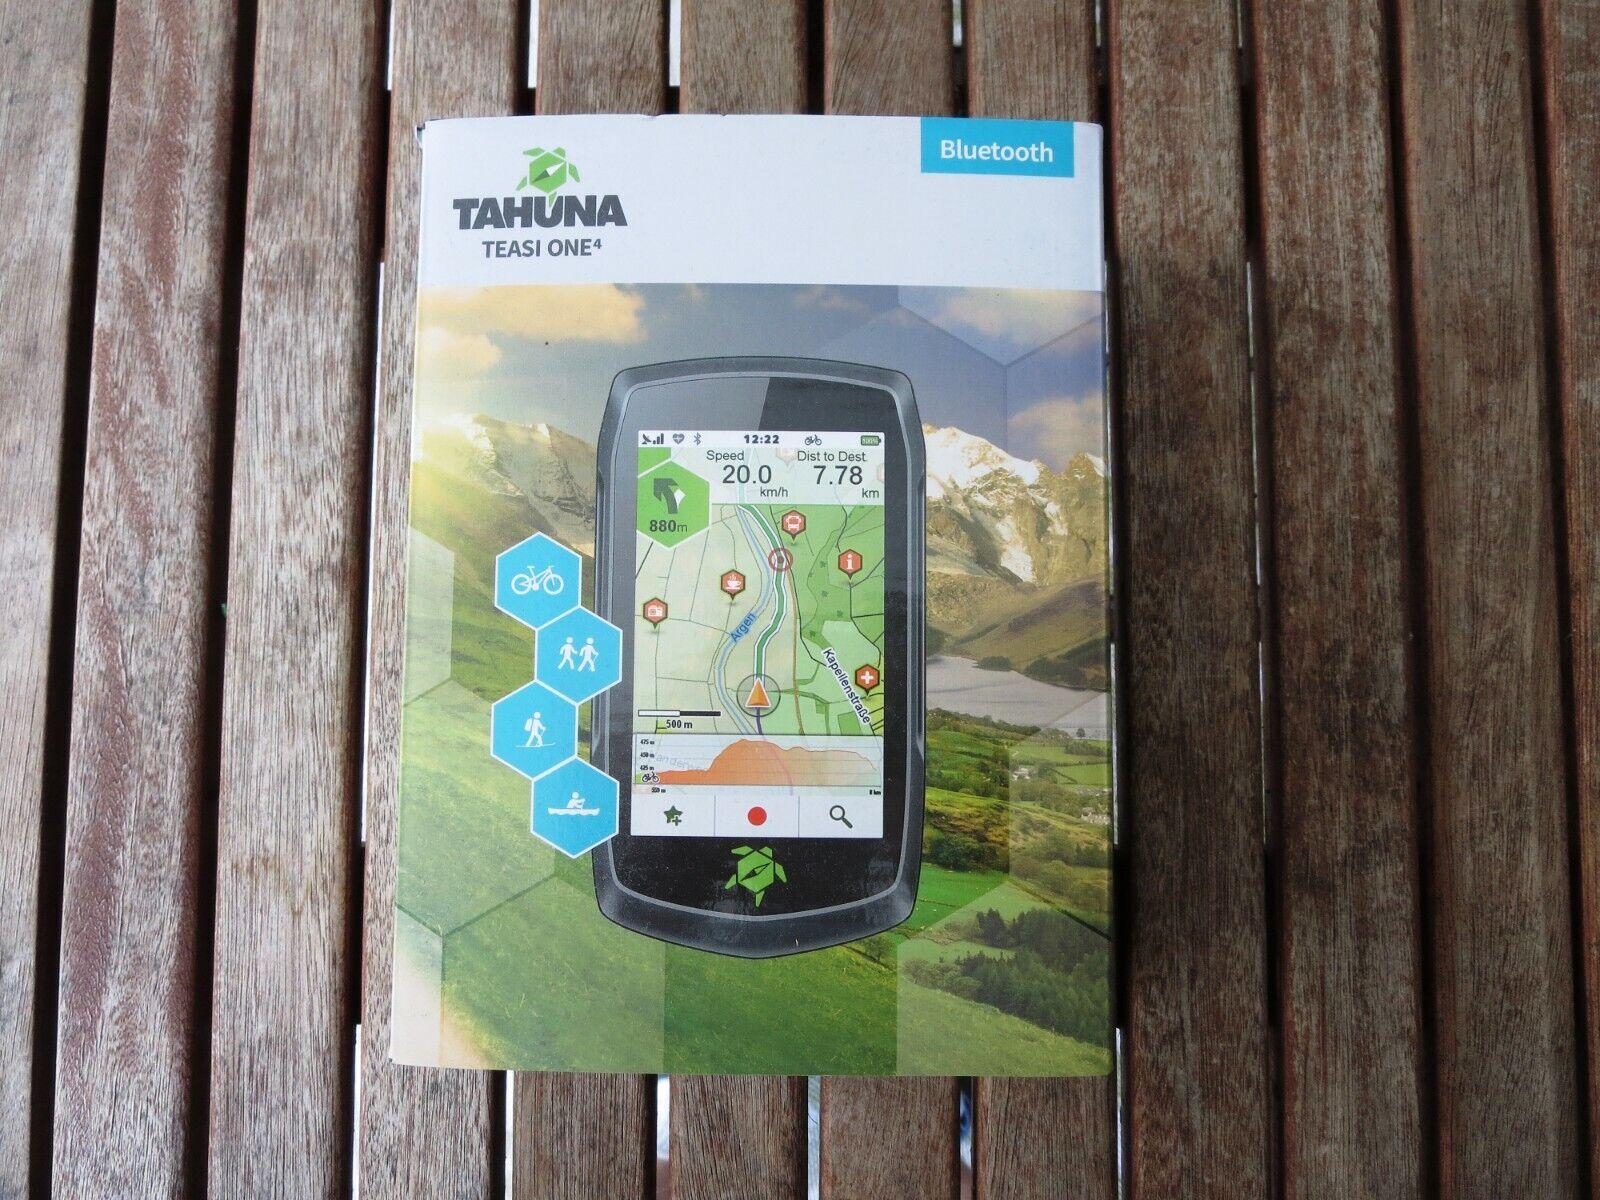 TEASI ONE 4 Bluetooth GPS Fahrrad Navigationsgerät - neu